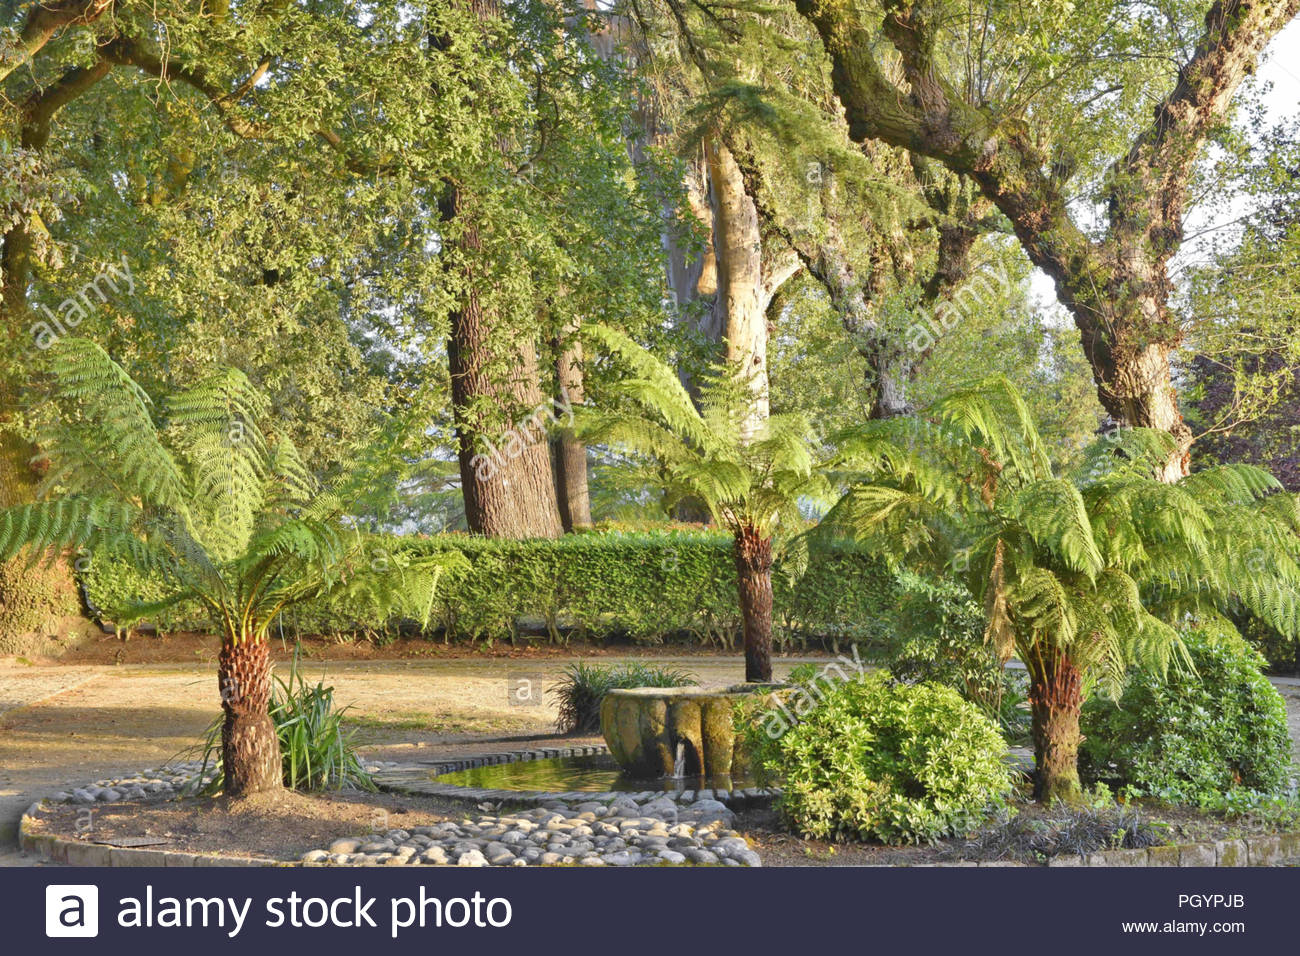 Old trees and fountain, lush green foliage, Alameda park in Santiago de Compostela Galicia Spain Europe. - Stock Image